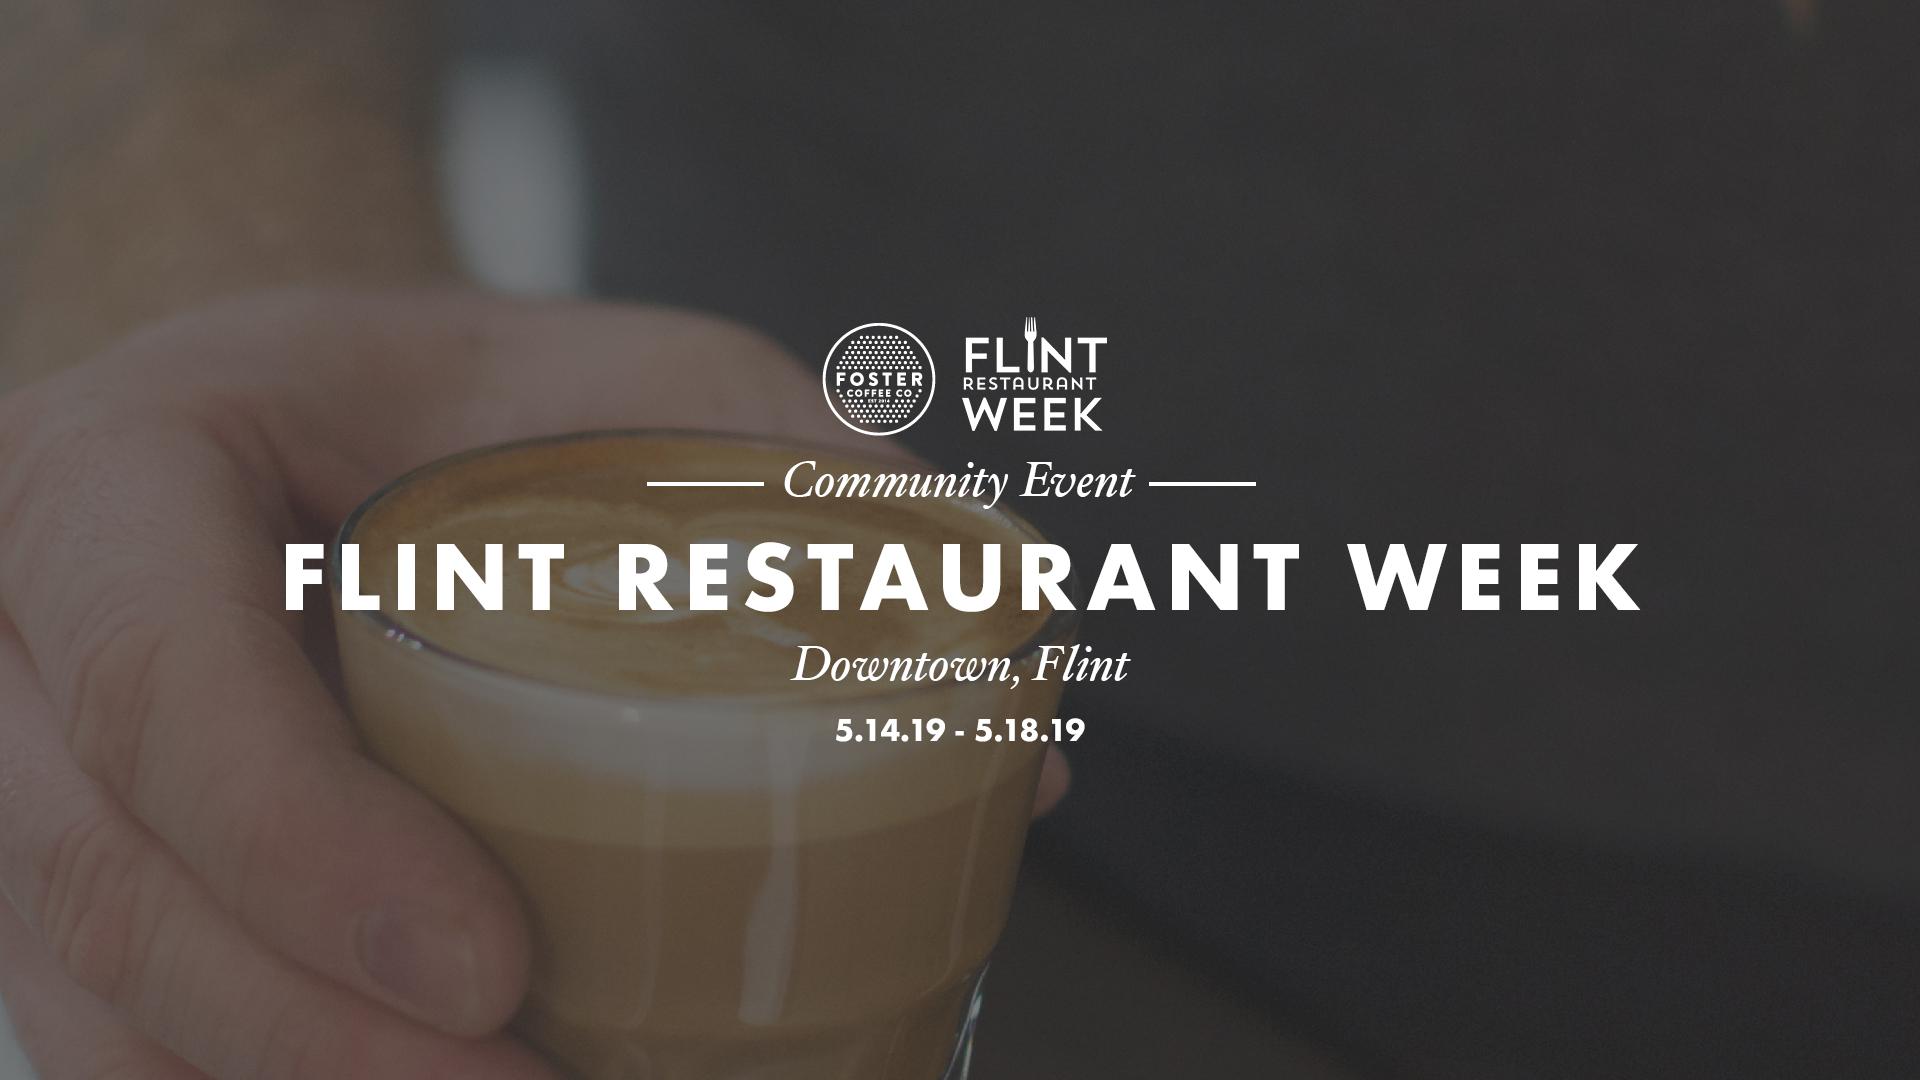 Flint_Restaurant_Foster.jpg